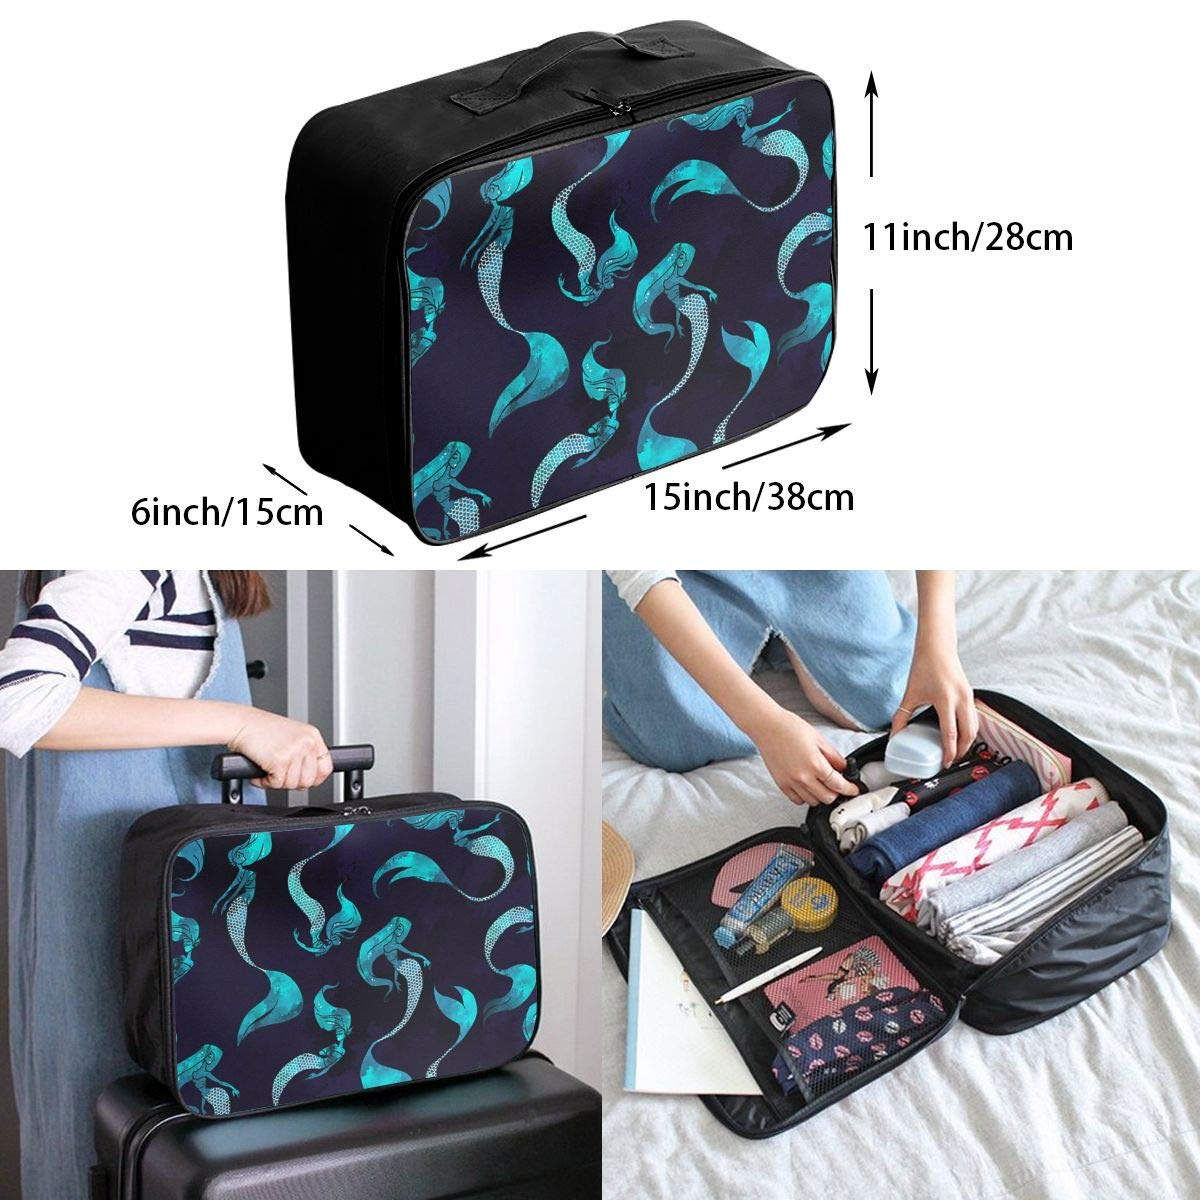 Travel Duffle Bag In Trolley Handle Lightweight Weekend Bags Nylon Luggage Duffel Bag Hand Bag Holiday Overnight Carry On Bag Dalmatians Cute Mint Coffee Best Dalmatian Dog Gym Sports